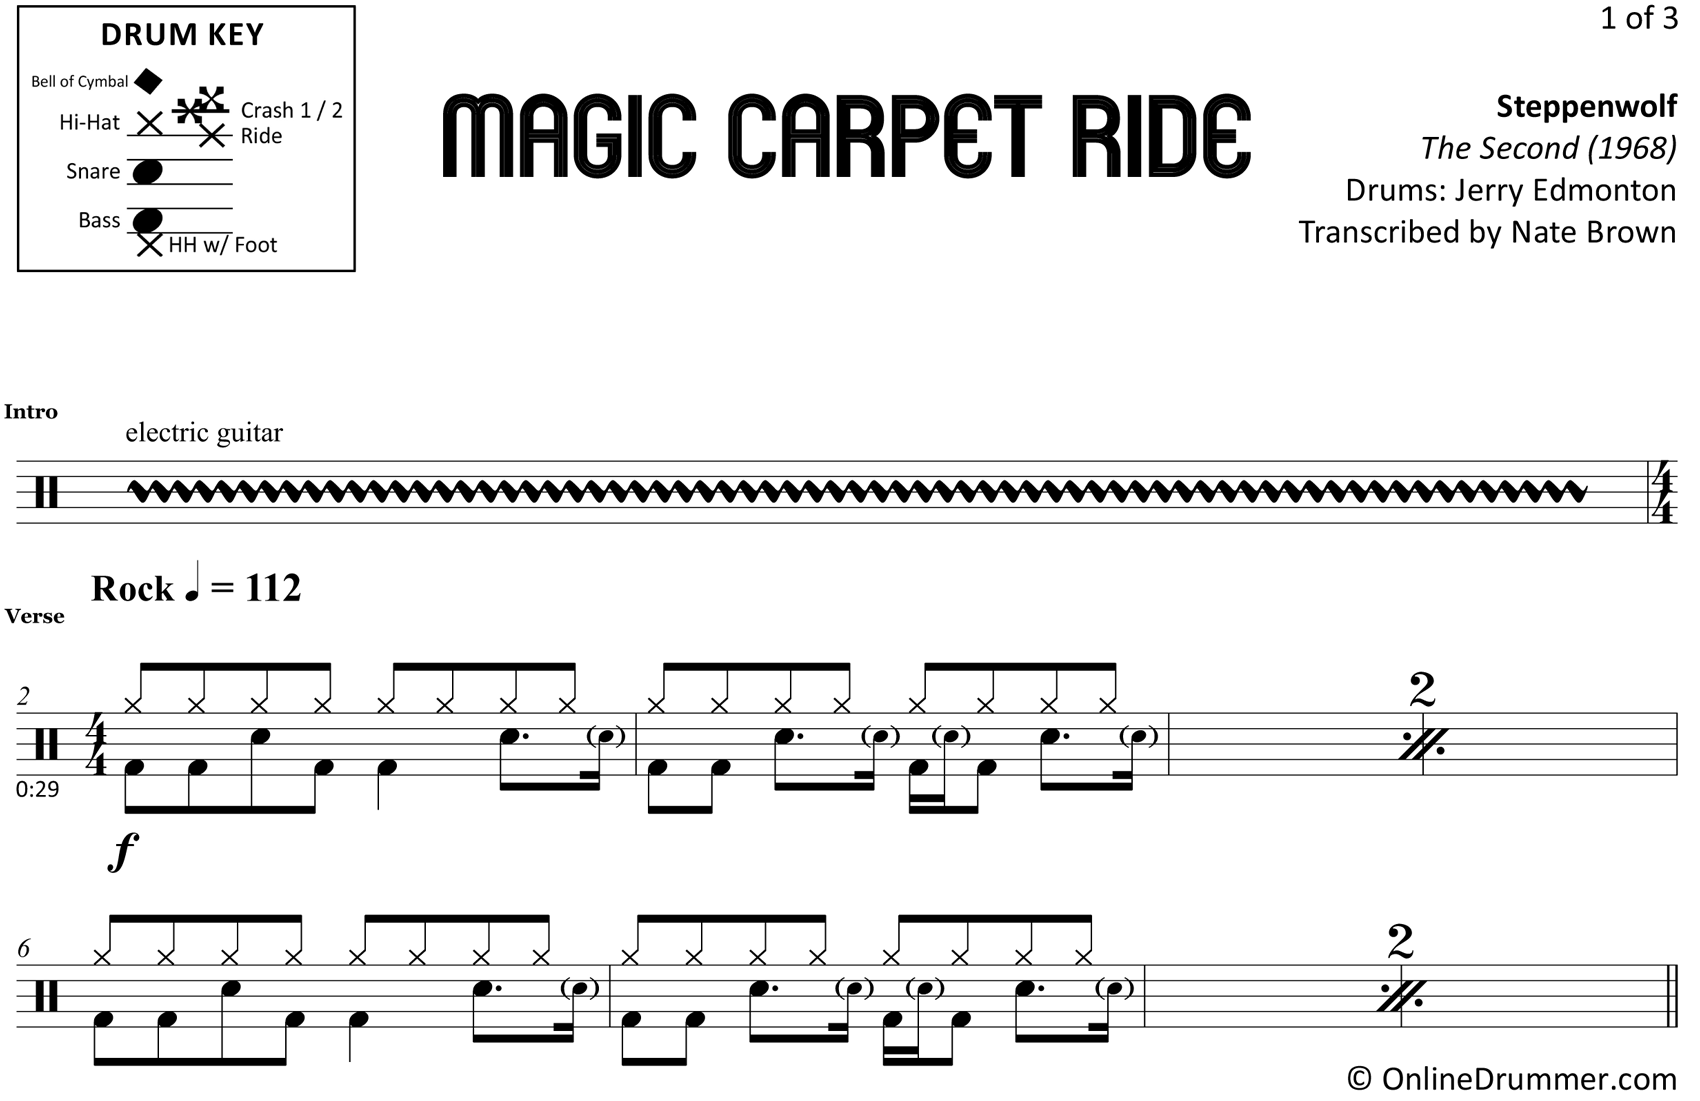 Magic Carpet Ride - Steppenwolf - Drum Sheet Music